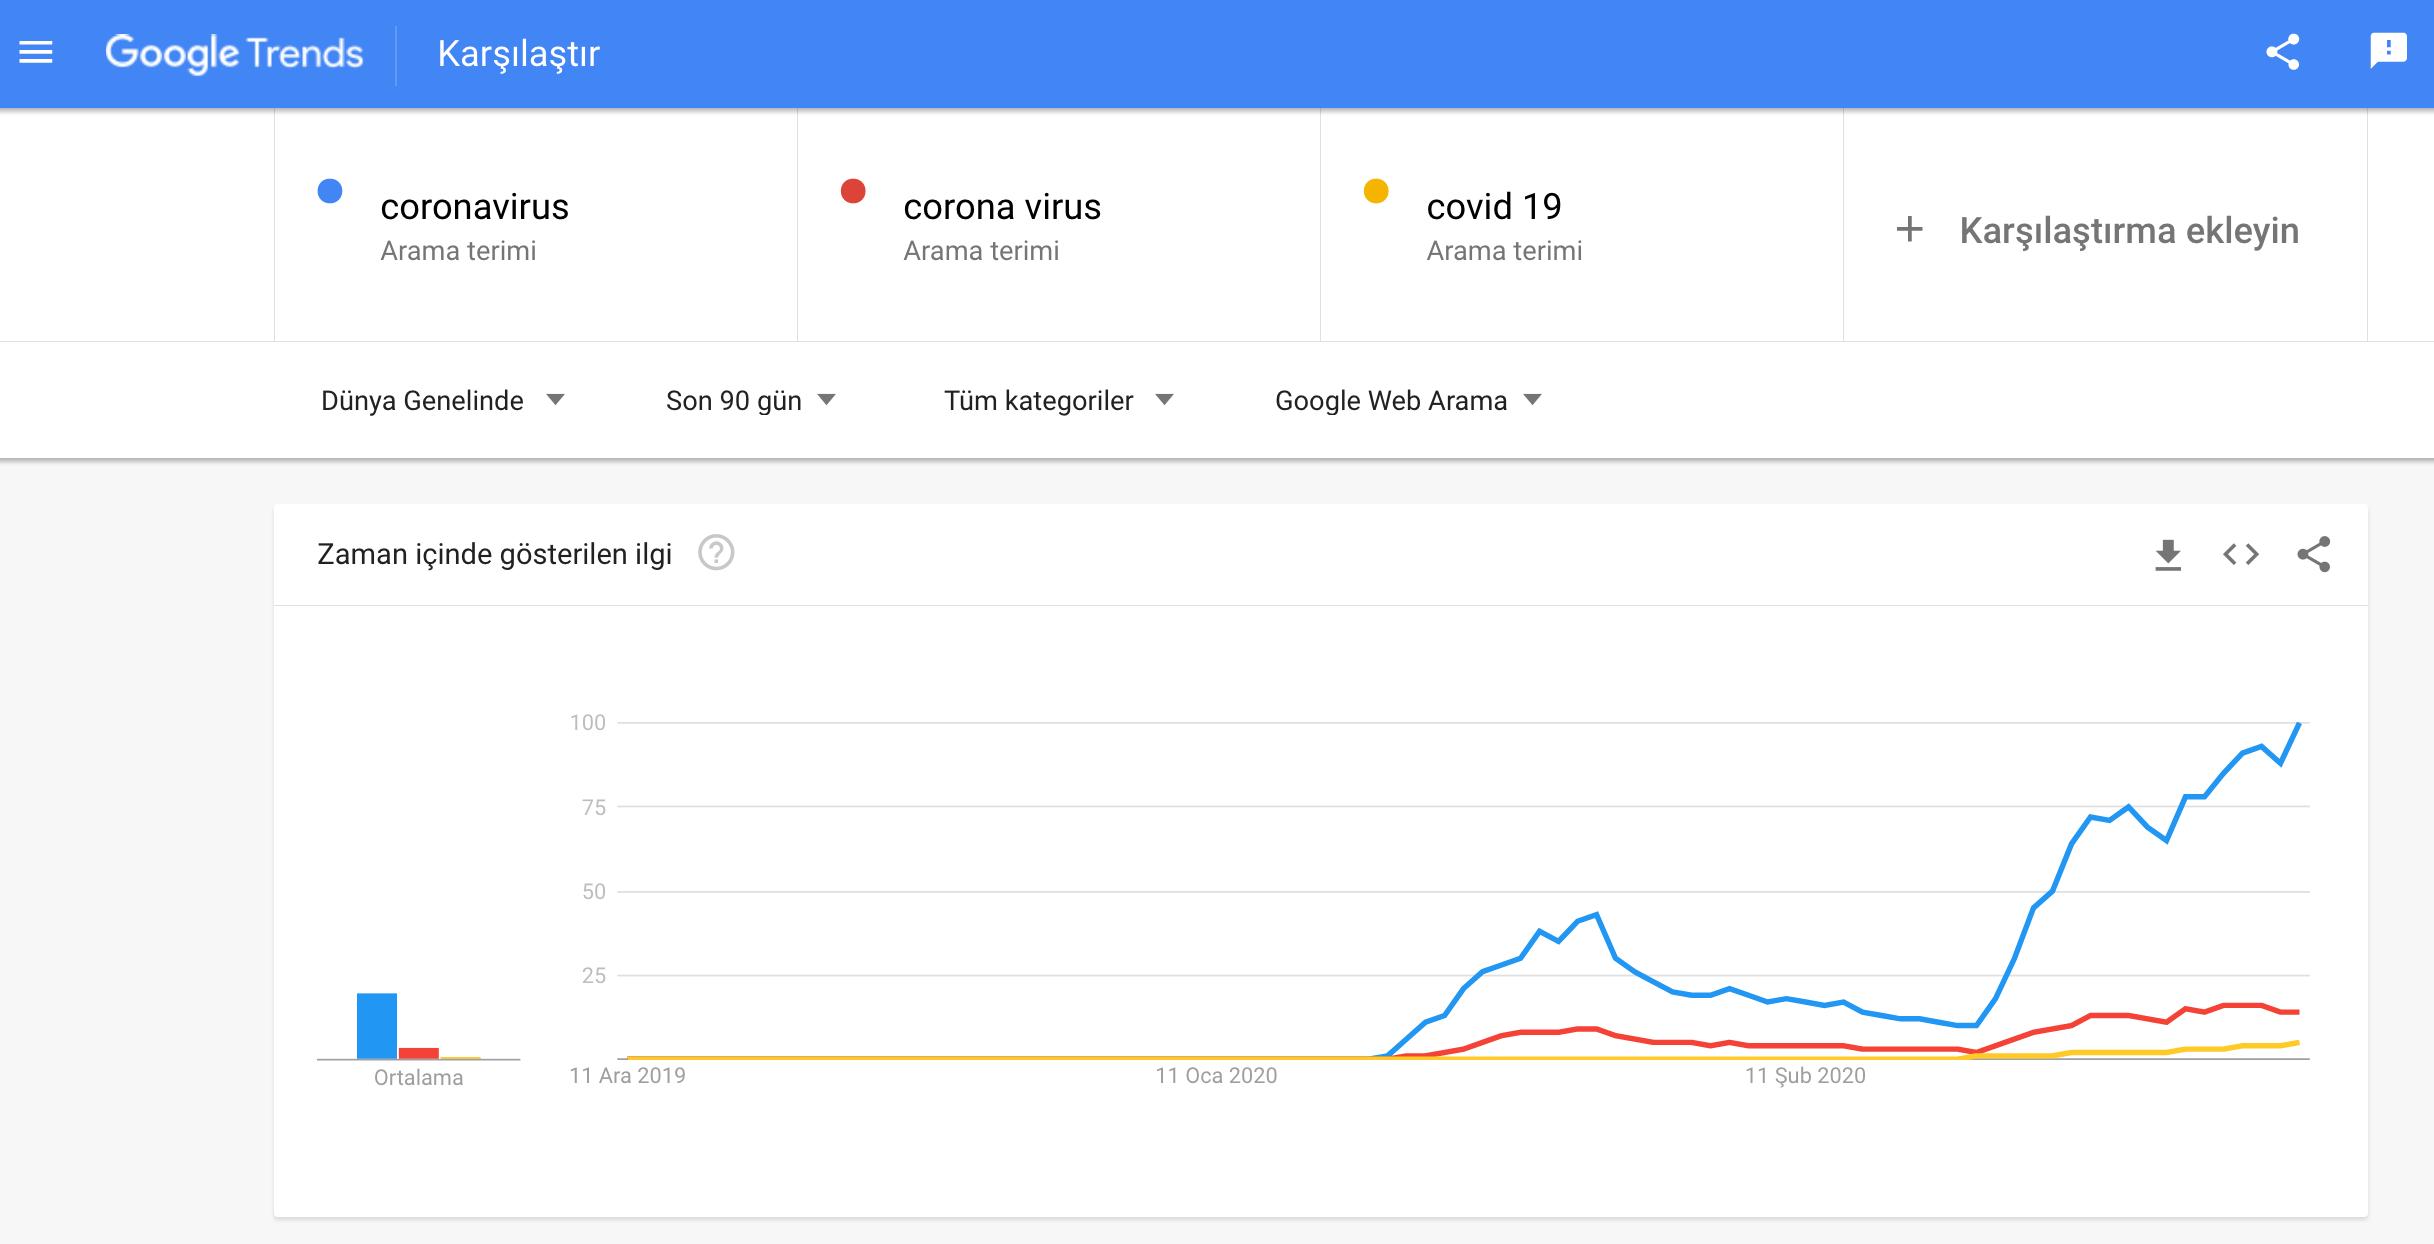 koronavirüs trendleri